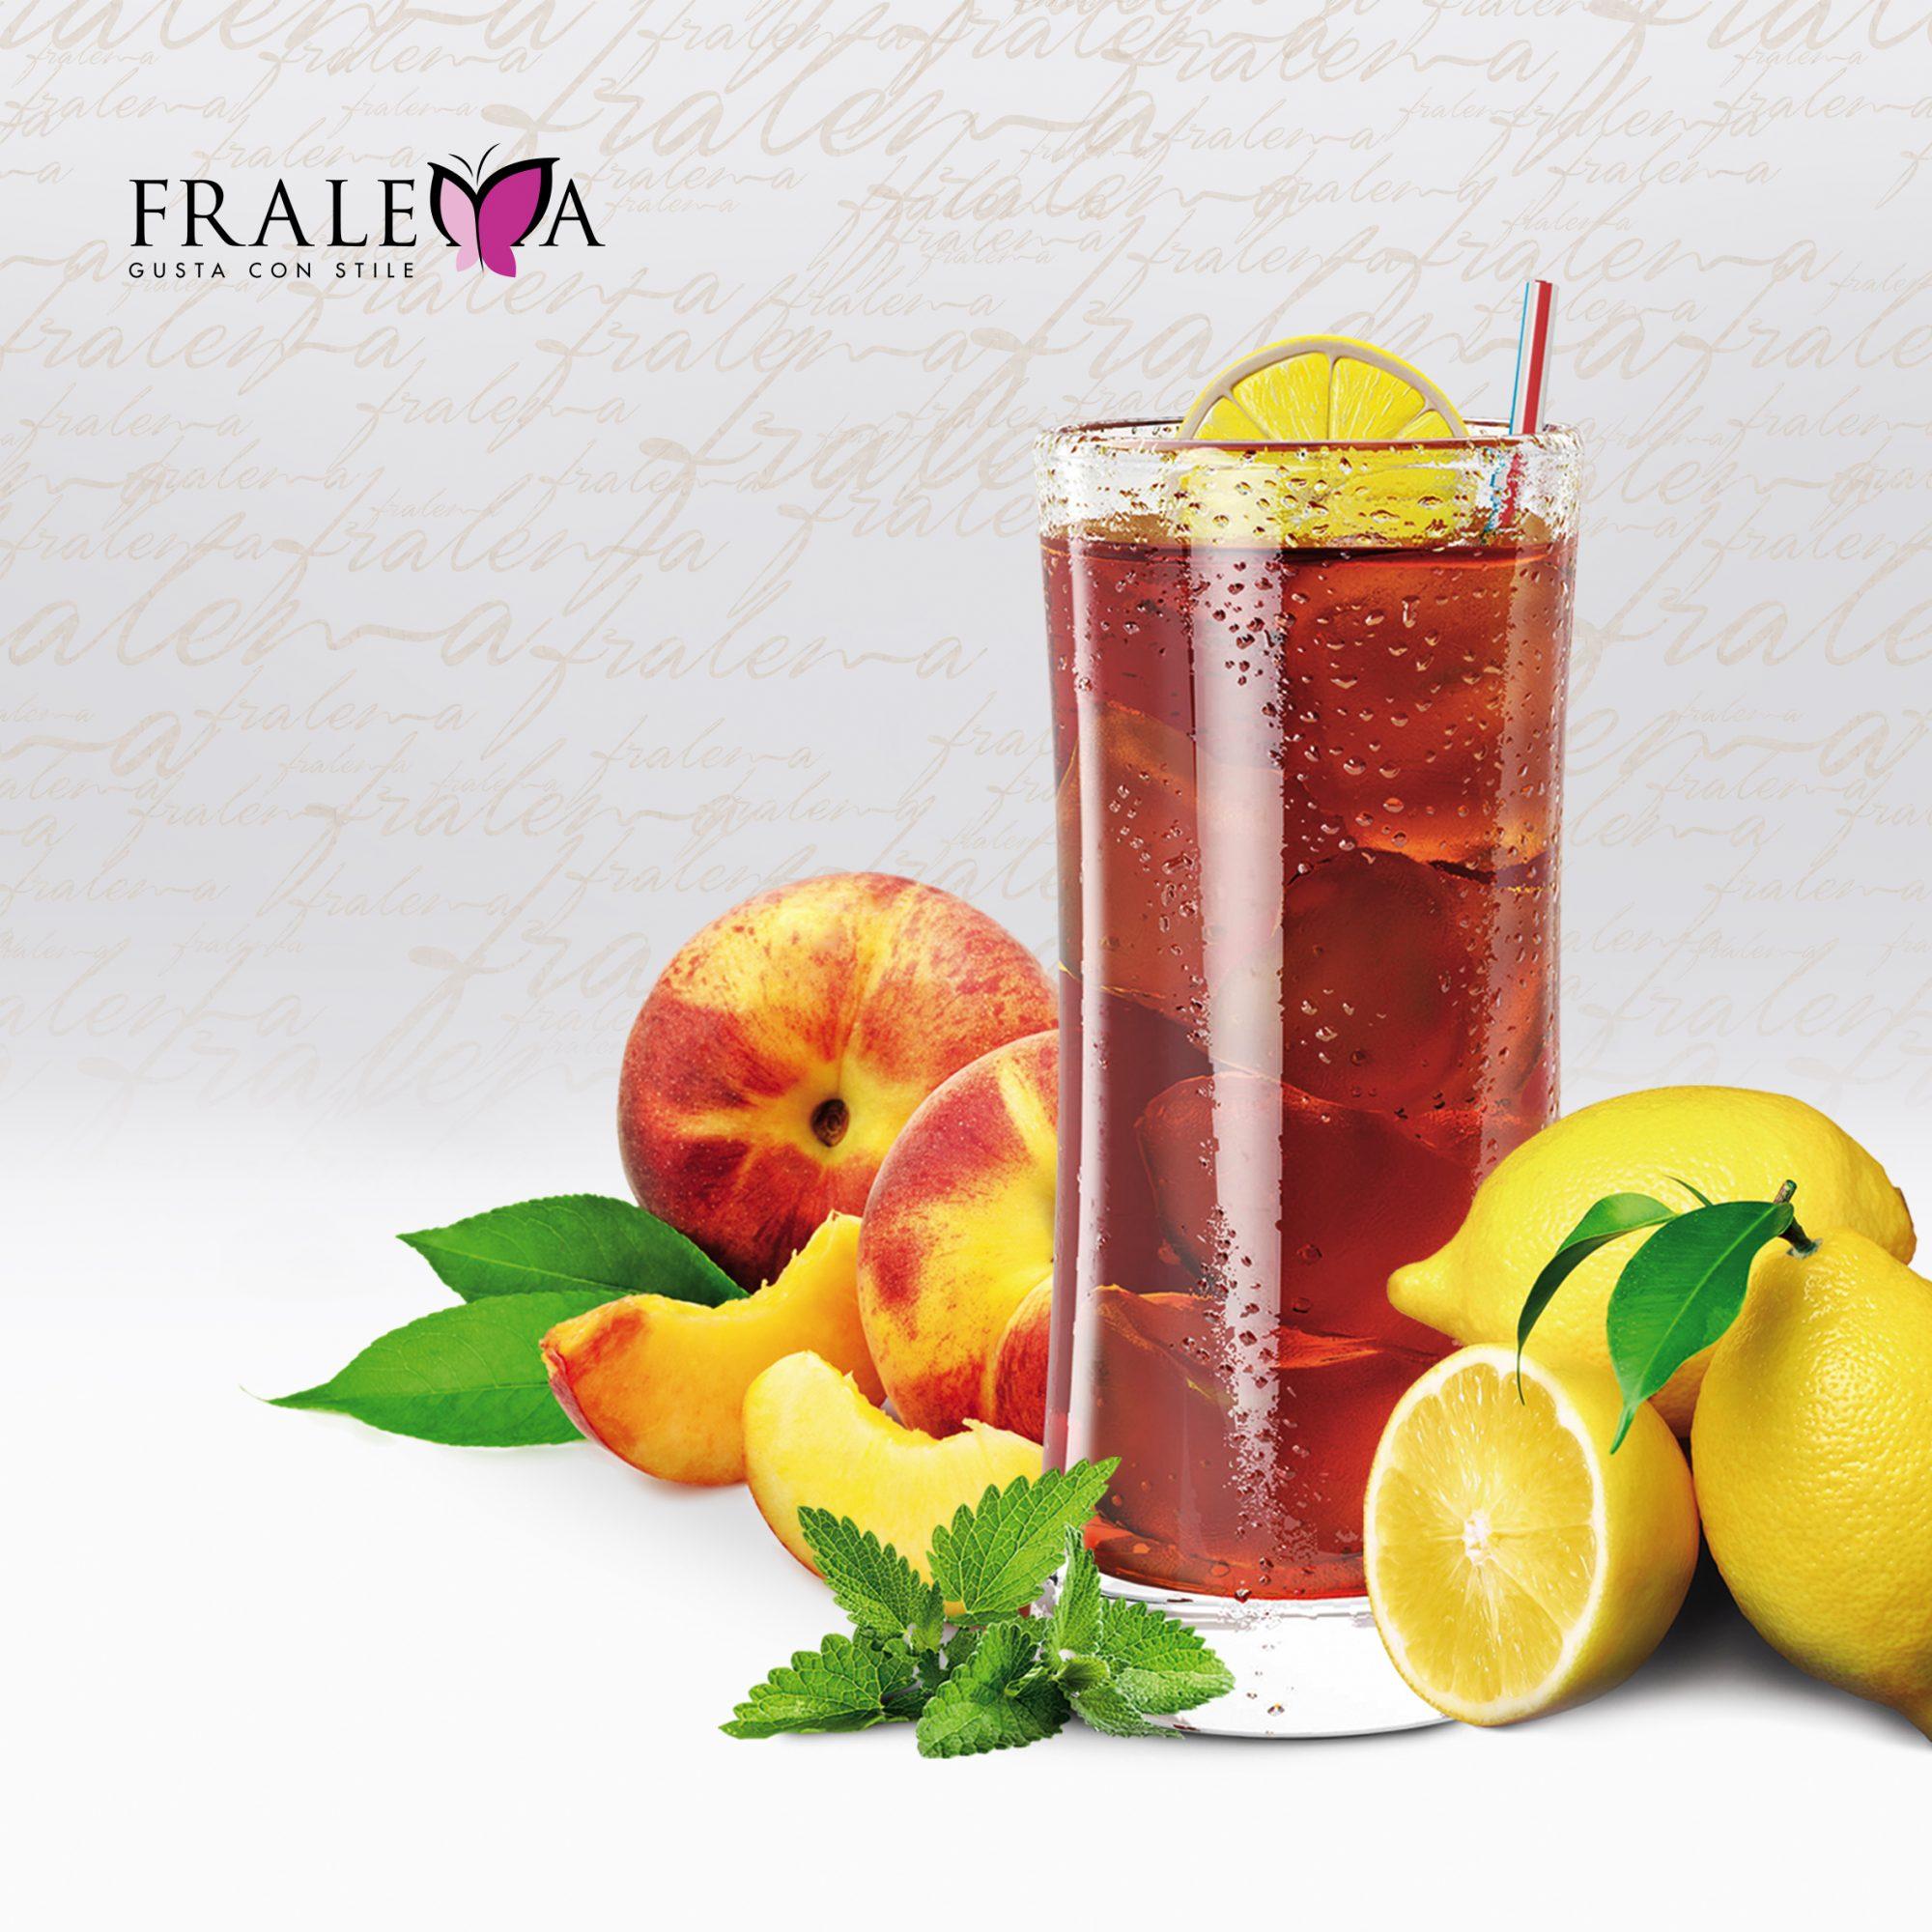 fralema_prodotti per la caffetteria_i freddi_te freddo_tè limone_tè pesca_tè verde